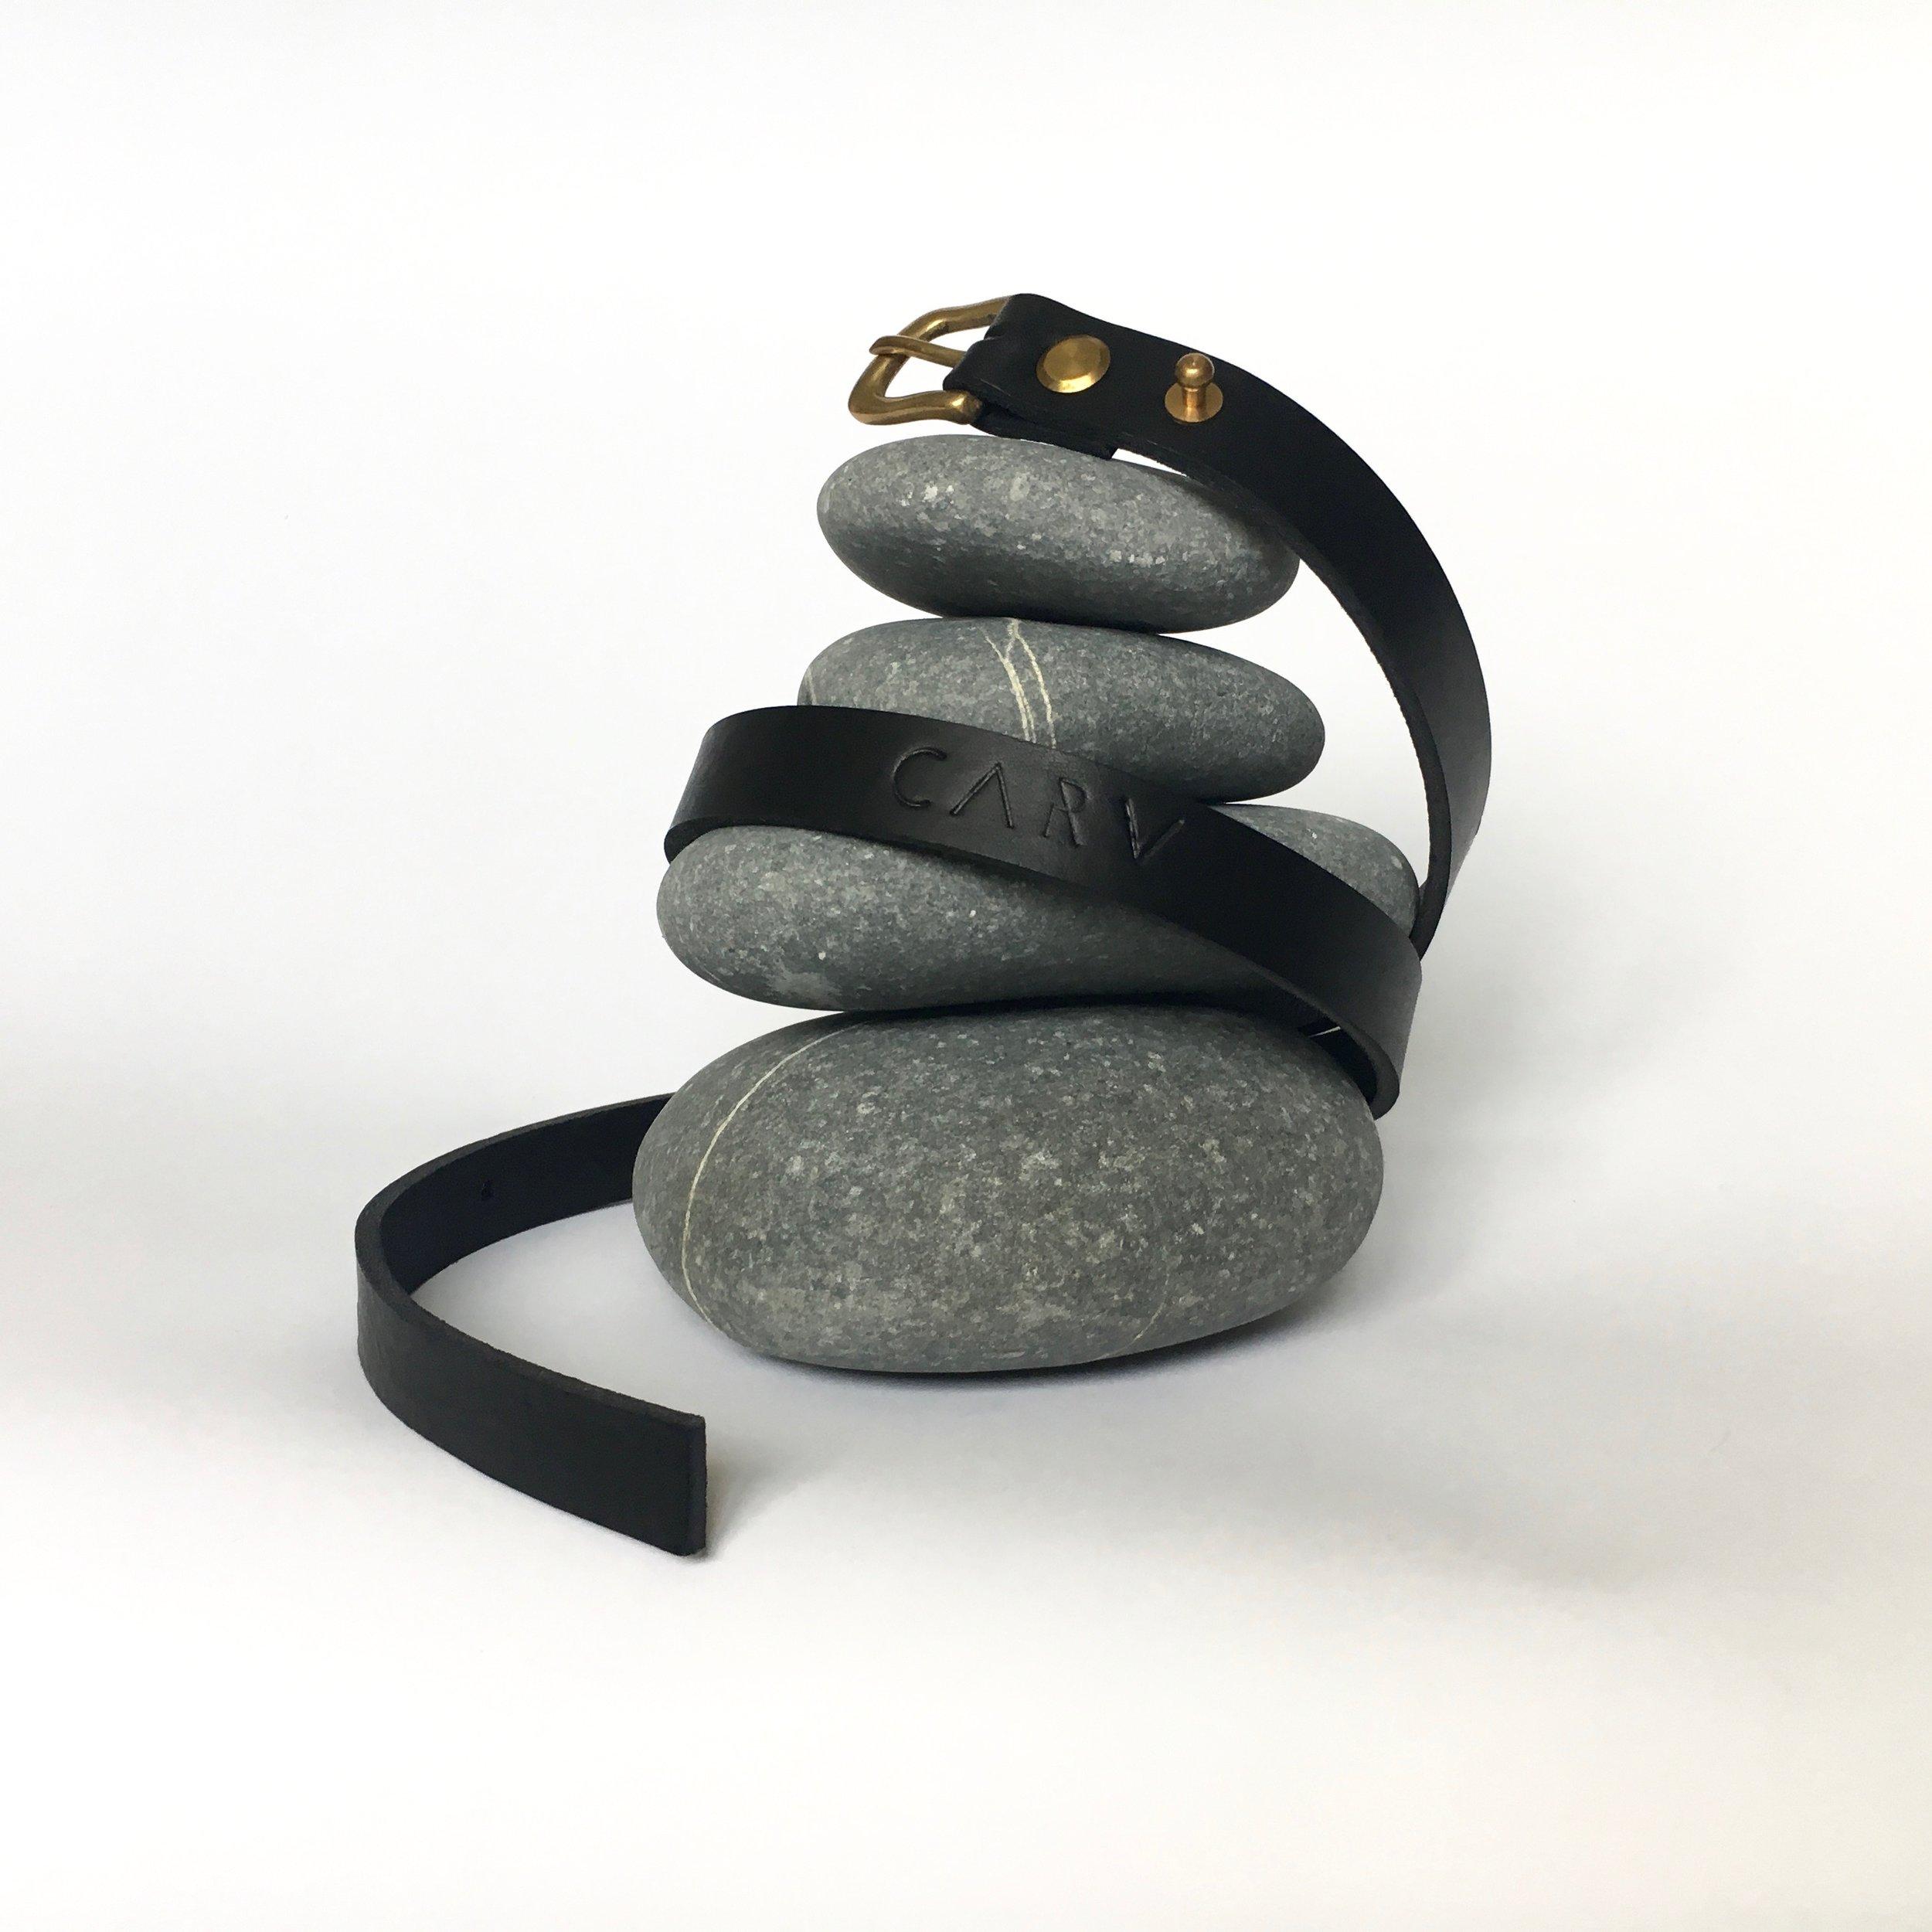 Black leather belt CARV